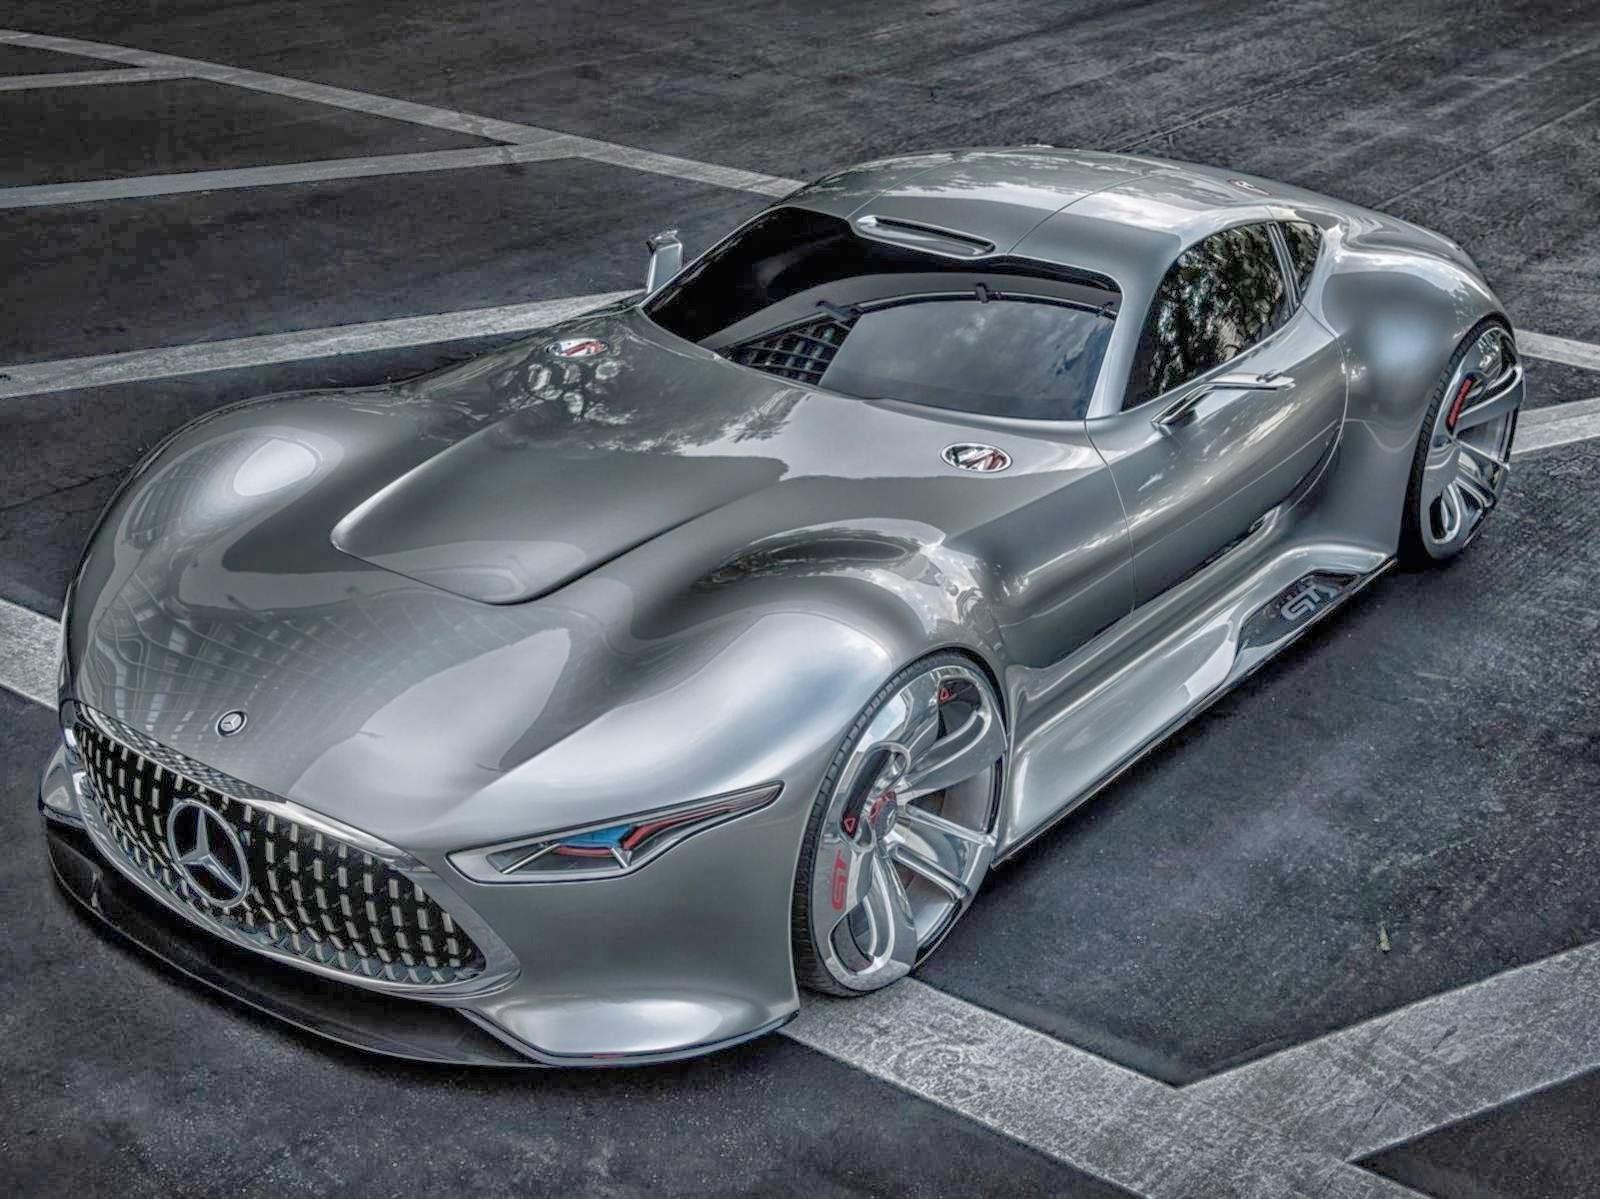 Mercedes benz vision gt conceitual estar no gt6 car for Mercedes benz vision